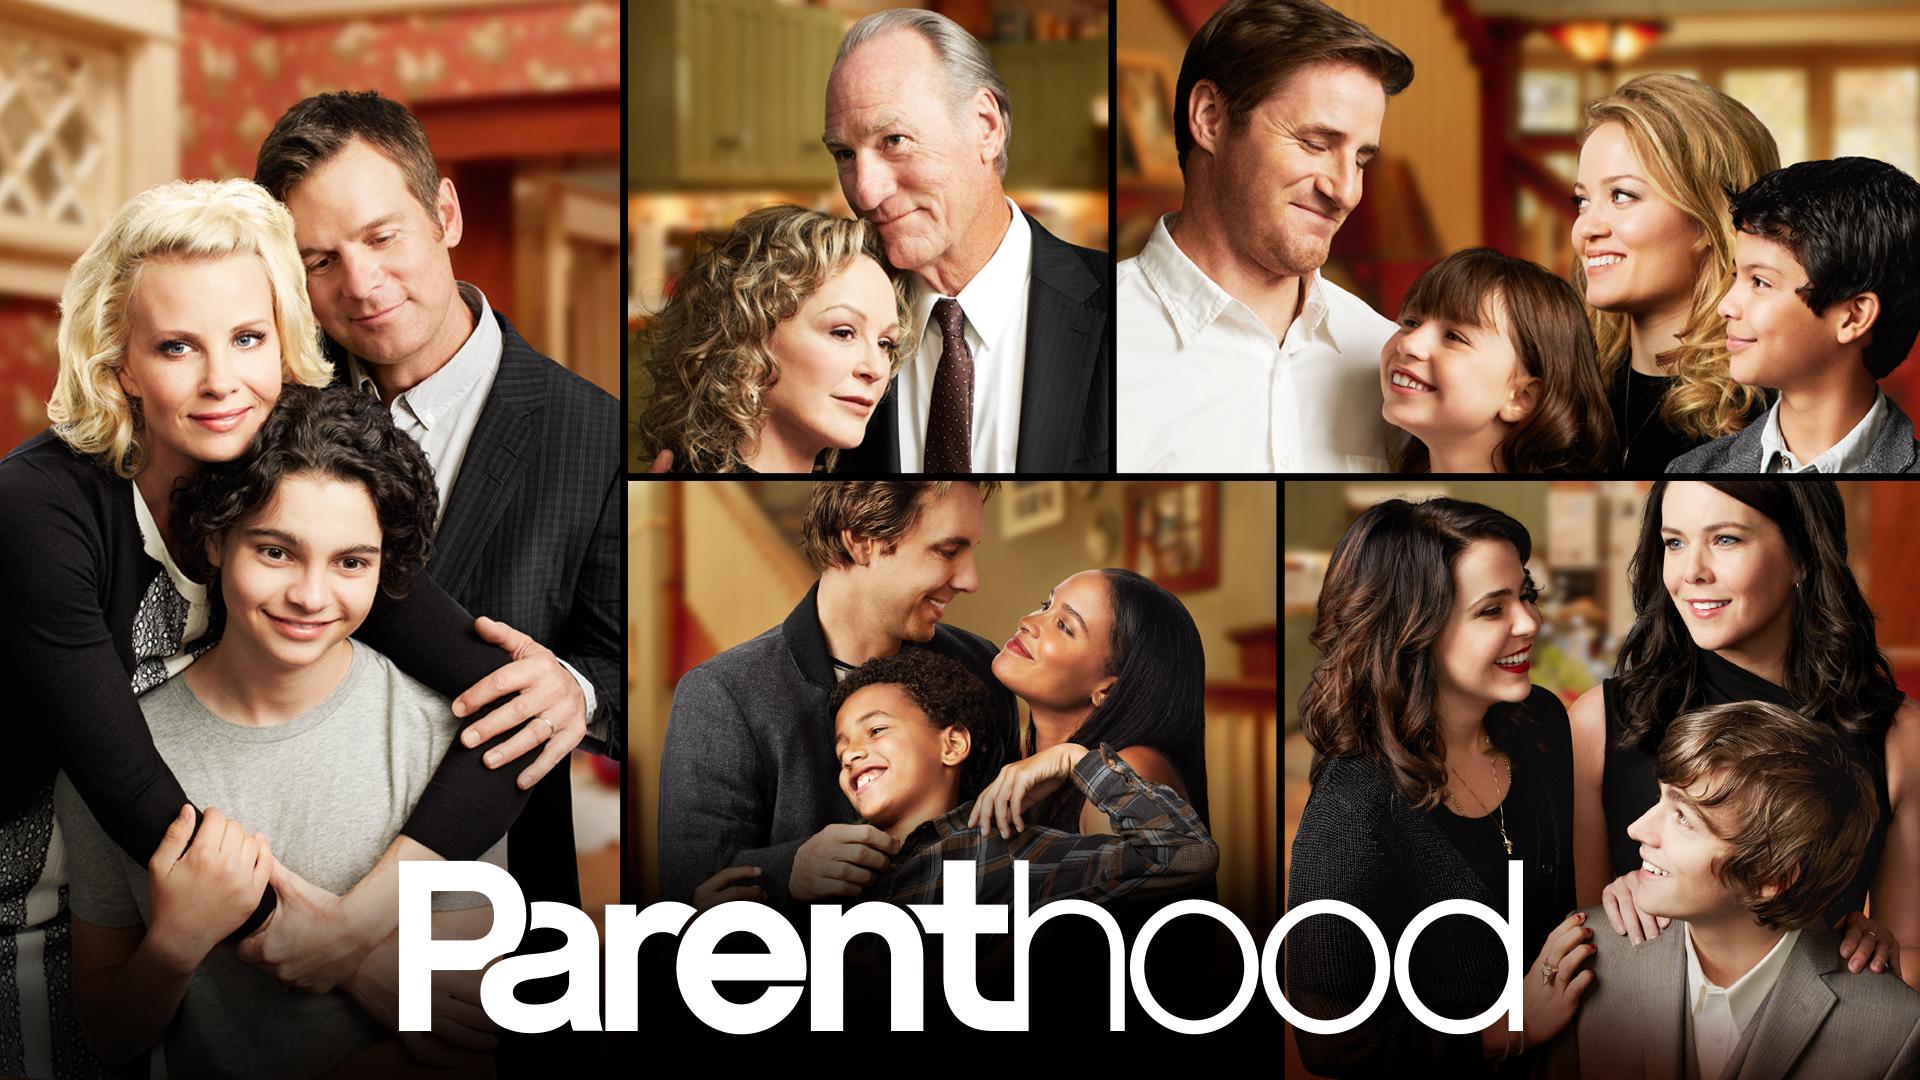 Parenthood | NBC Parenthood Cast